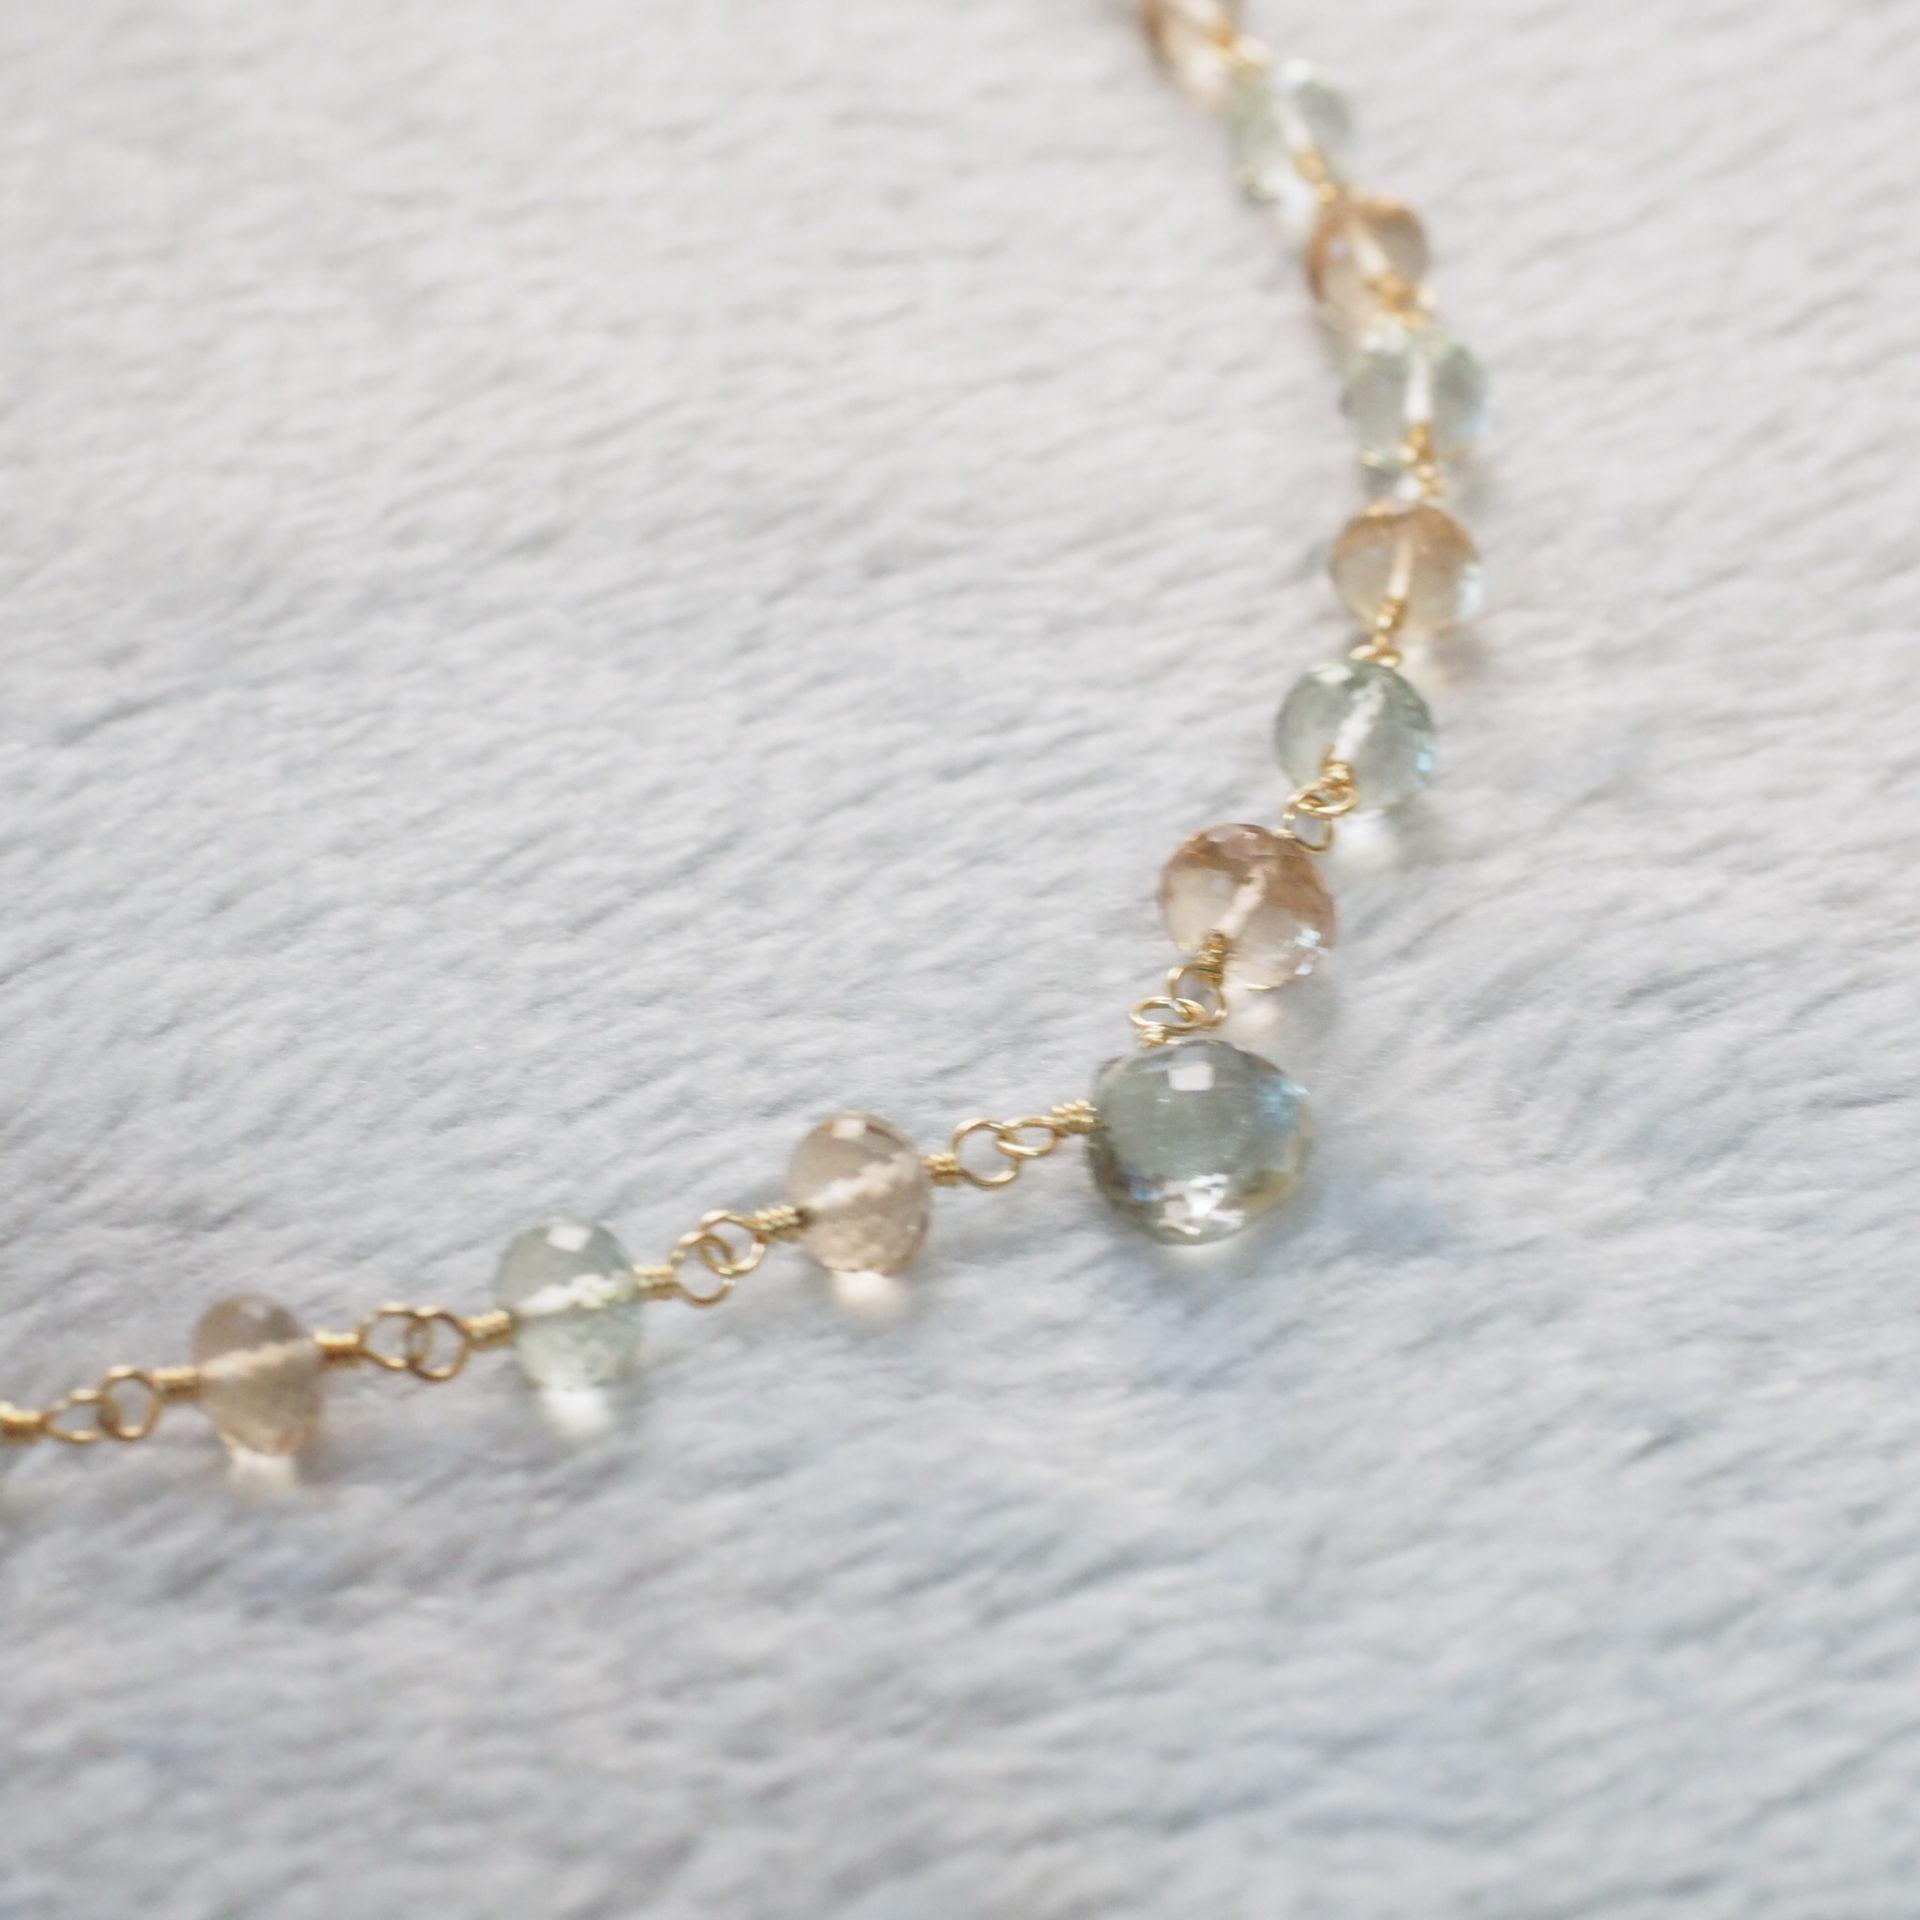 Green-Amethyst-Citrine-Necklace